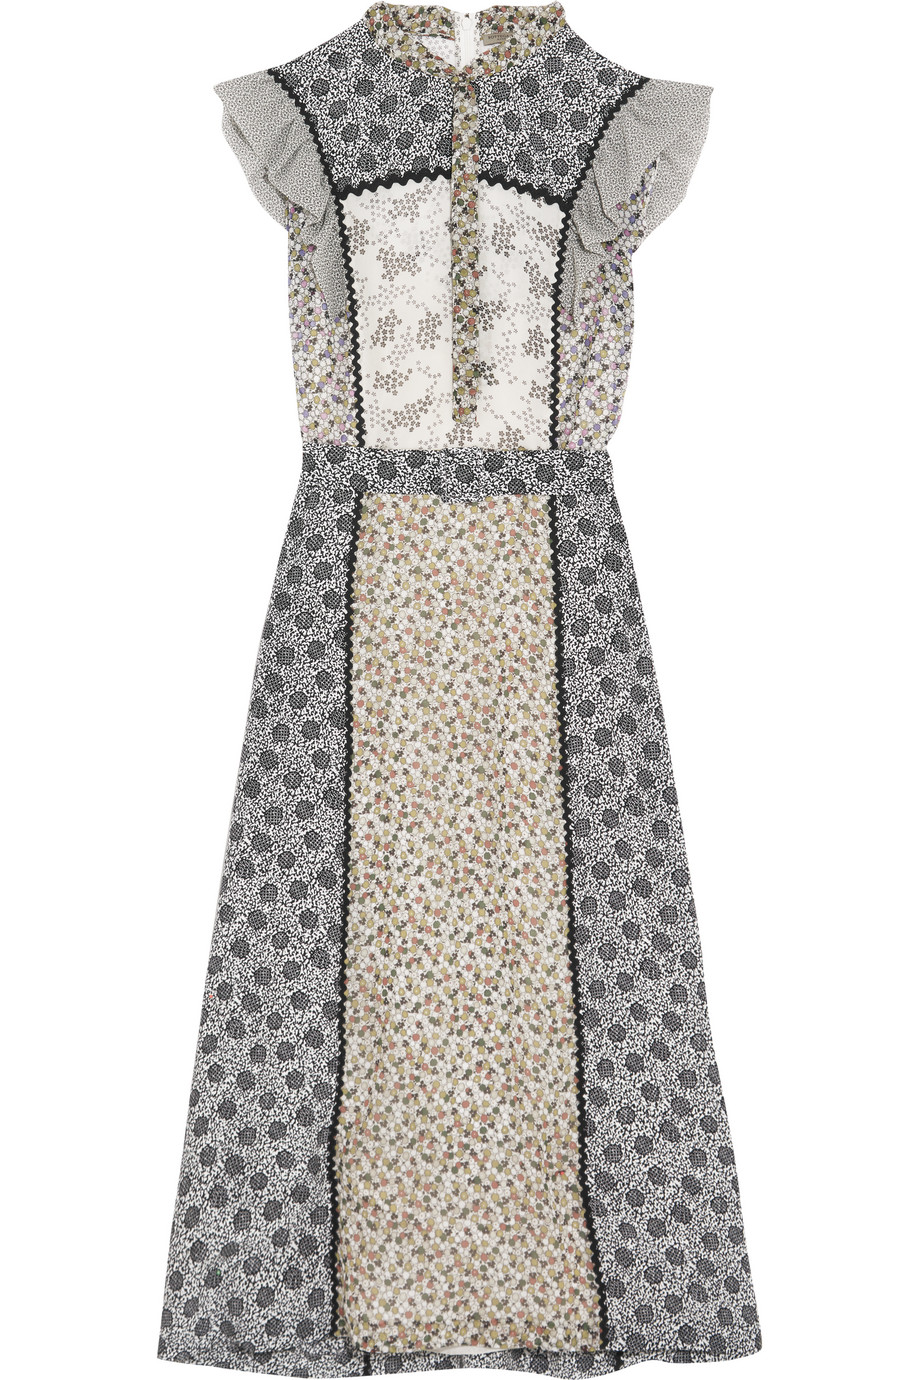 Bottega Veneta Ruffled Floral-Print Silk Midi Dress, Sky Blue/Gray, Women's - Floral, Size: 44